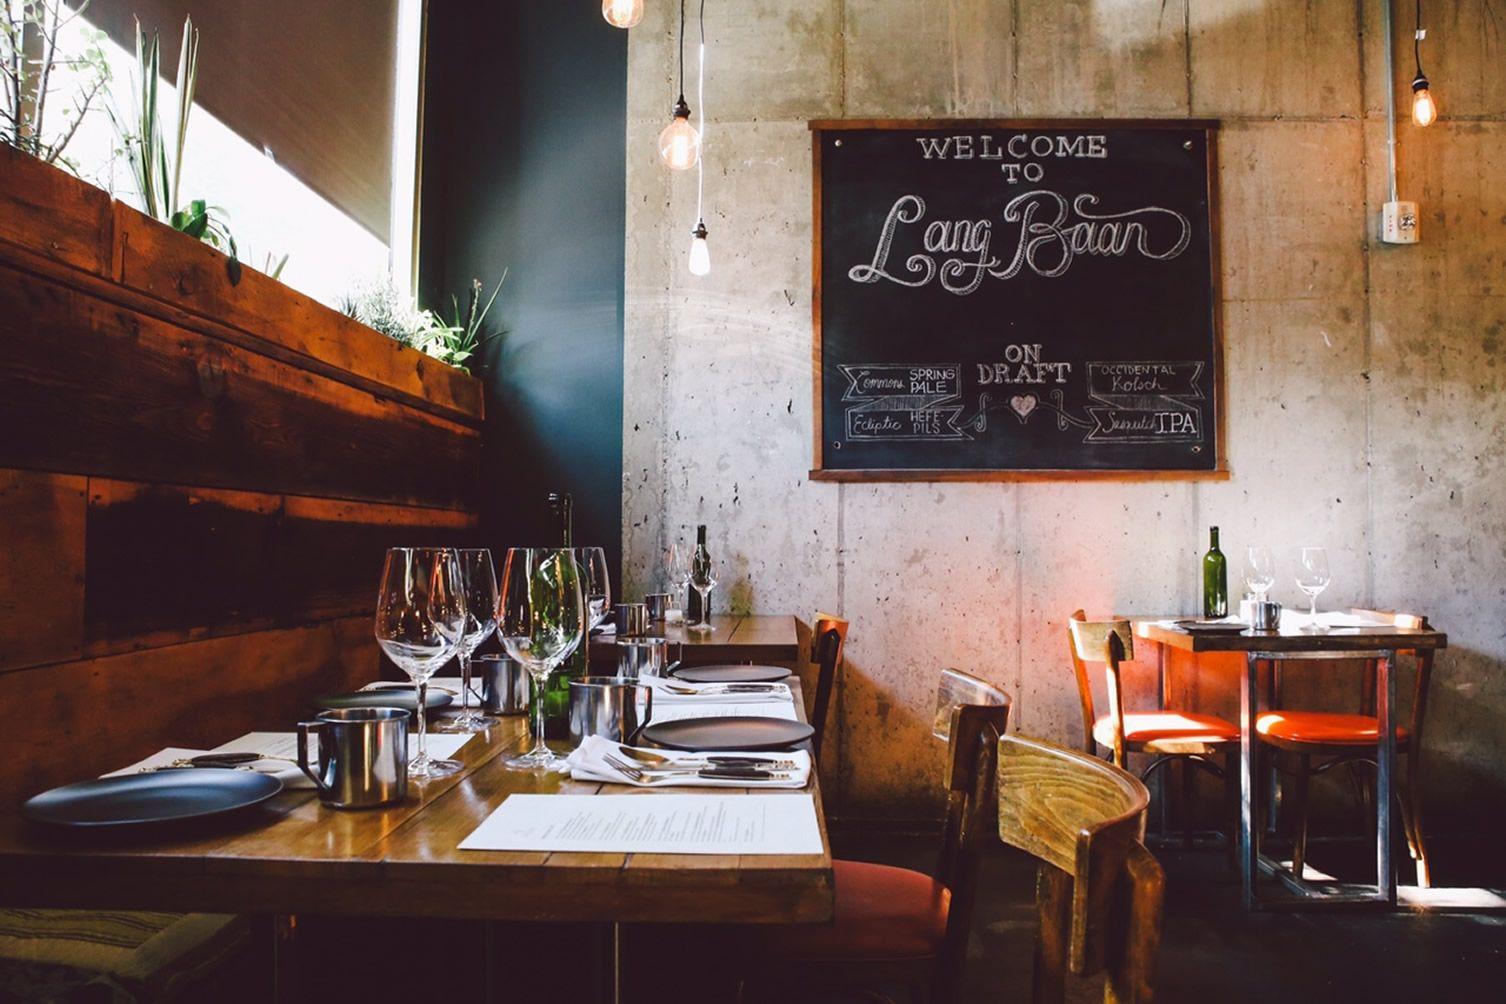 Tasting menu, Cafe design, Menu